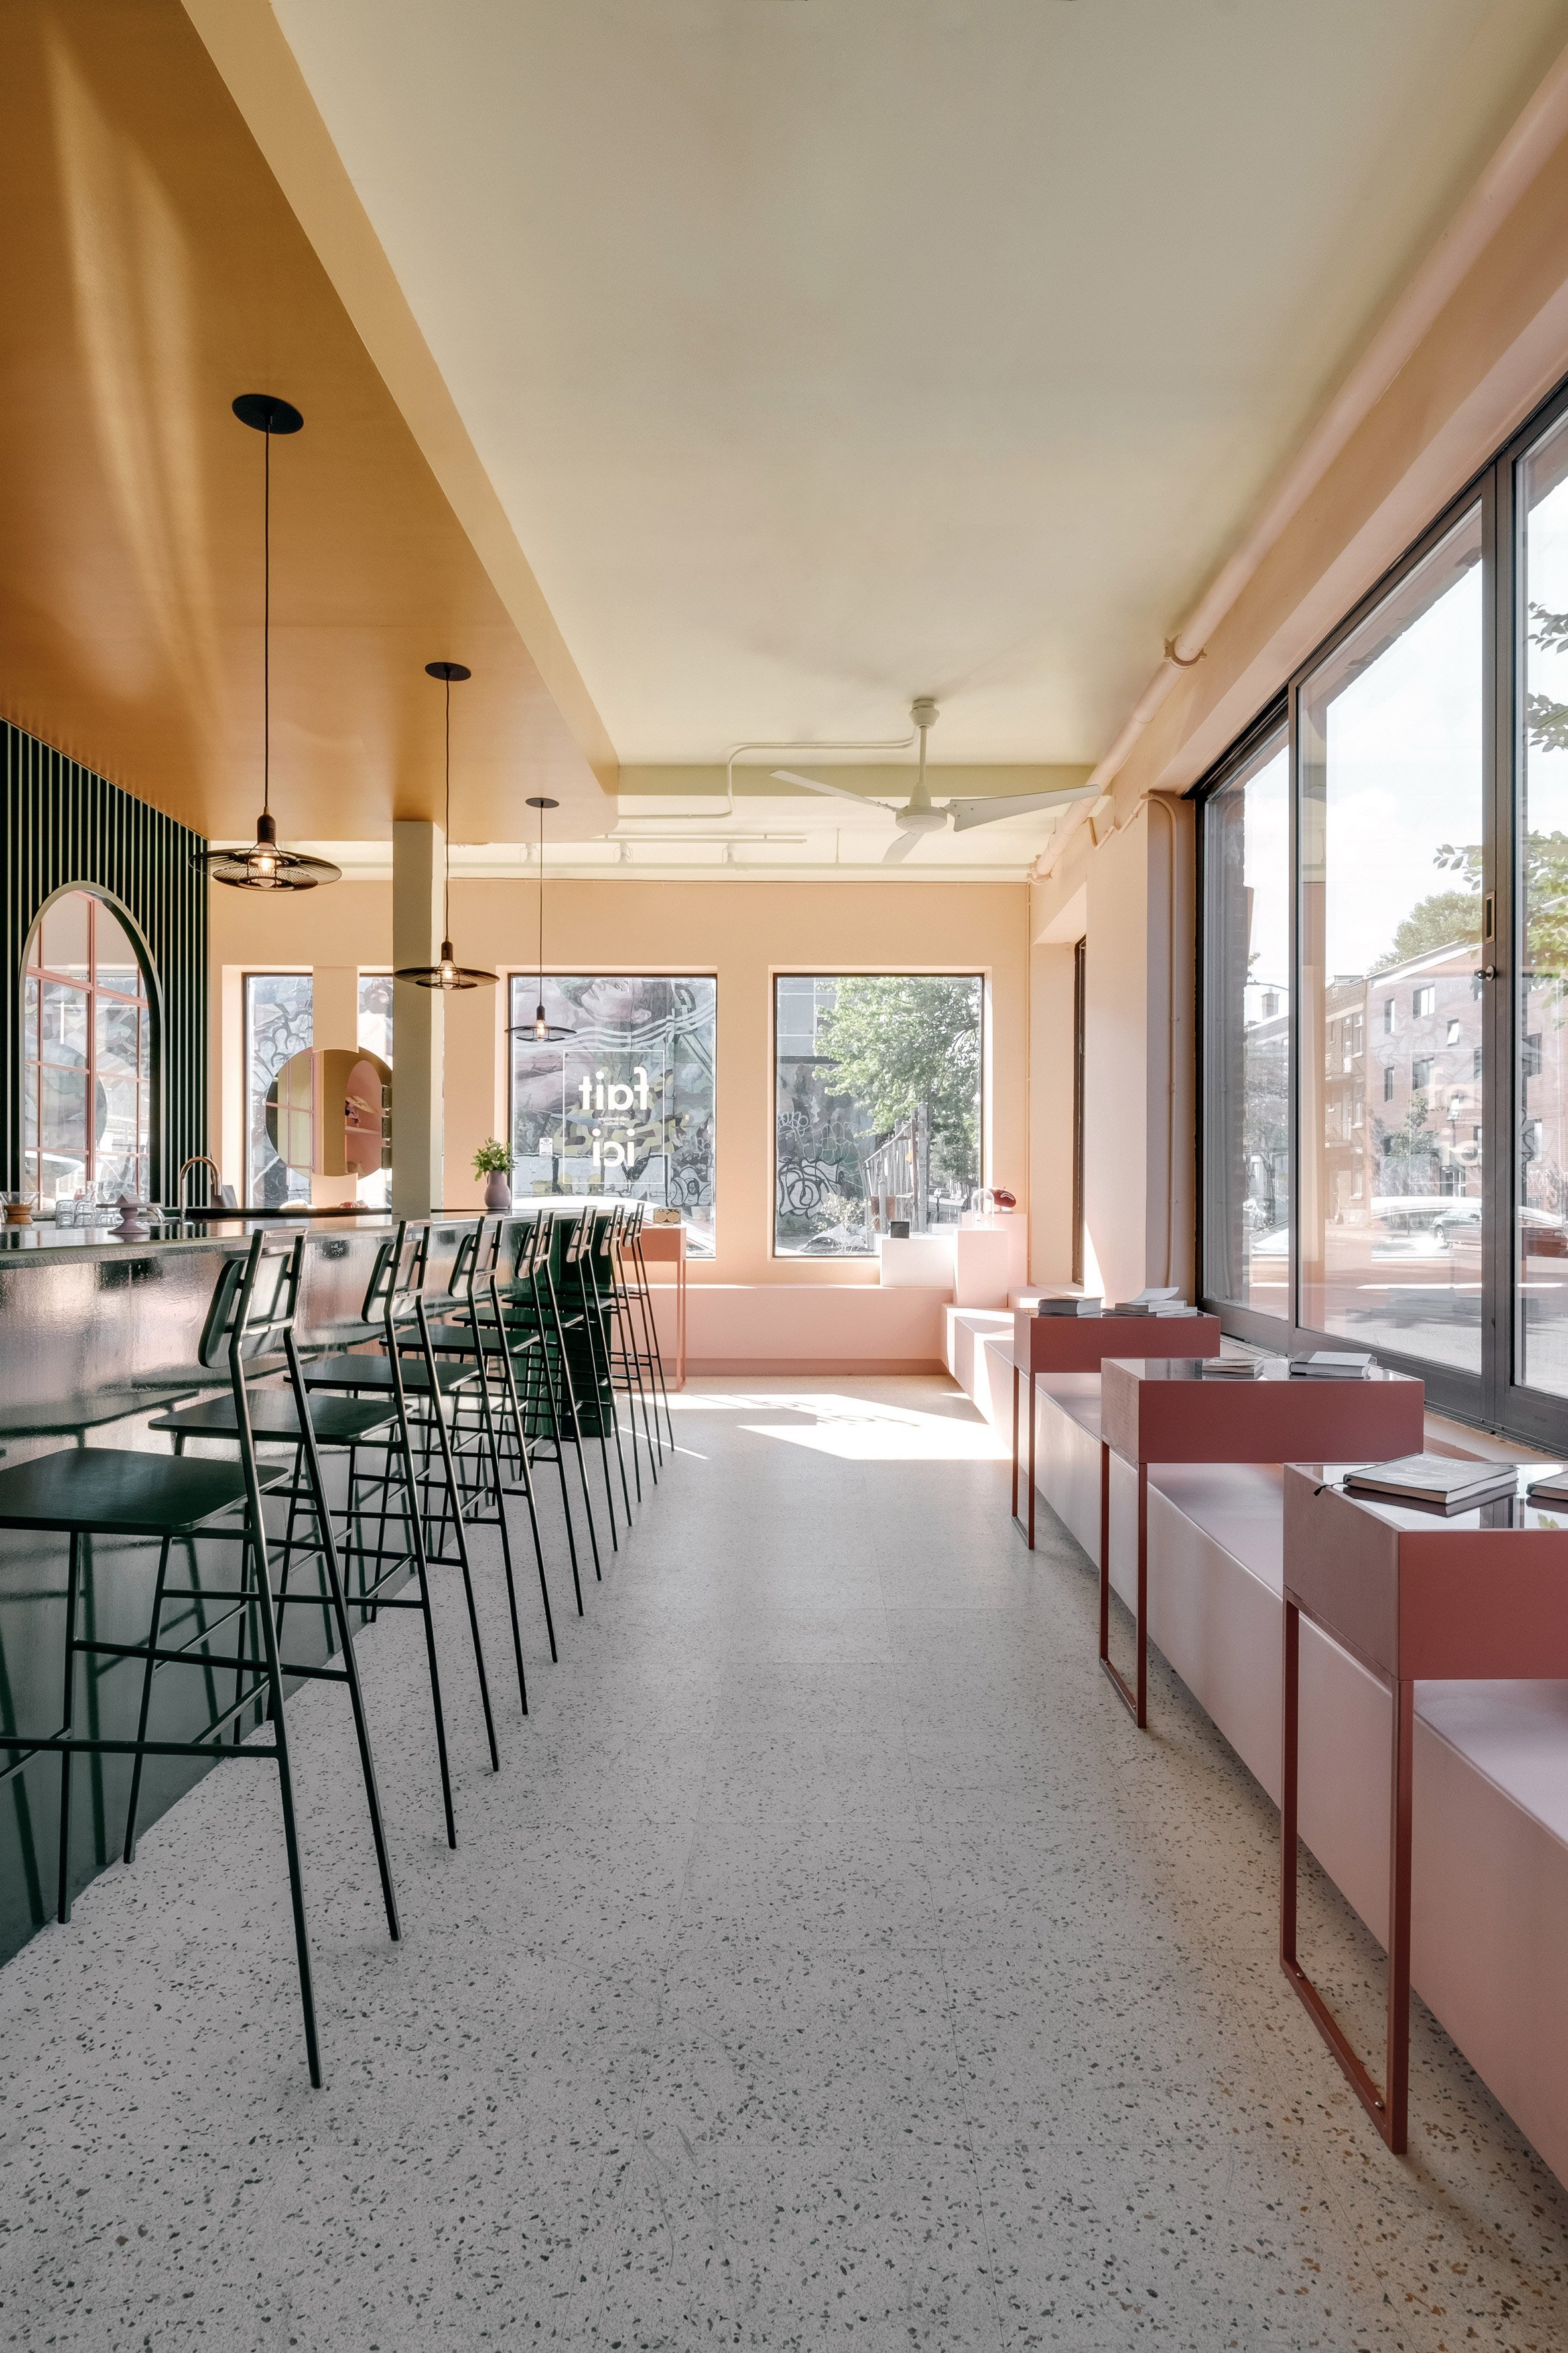 IGNANT-Architecture-Appareil-Architects-Pastel-Rita-Cafe-002